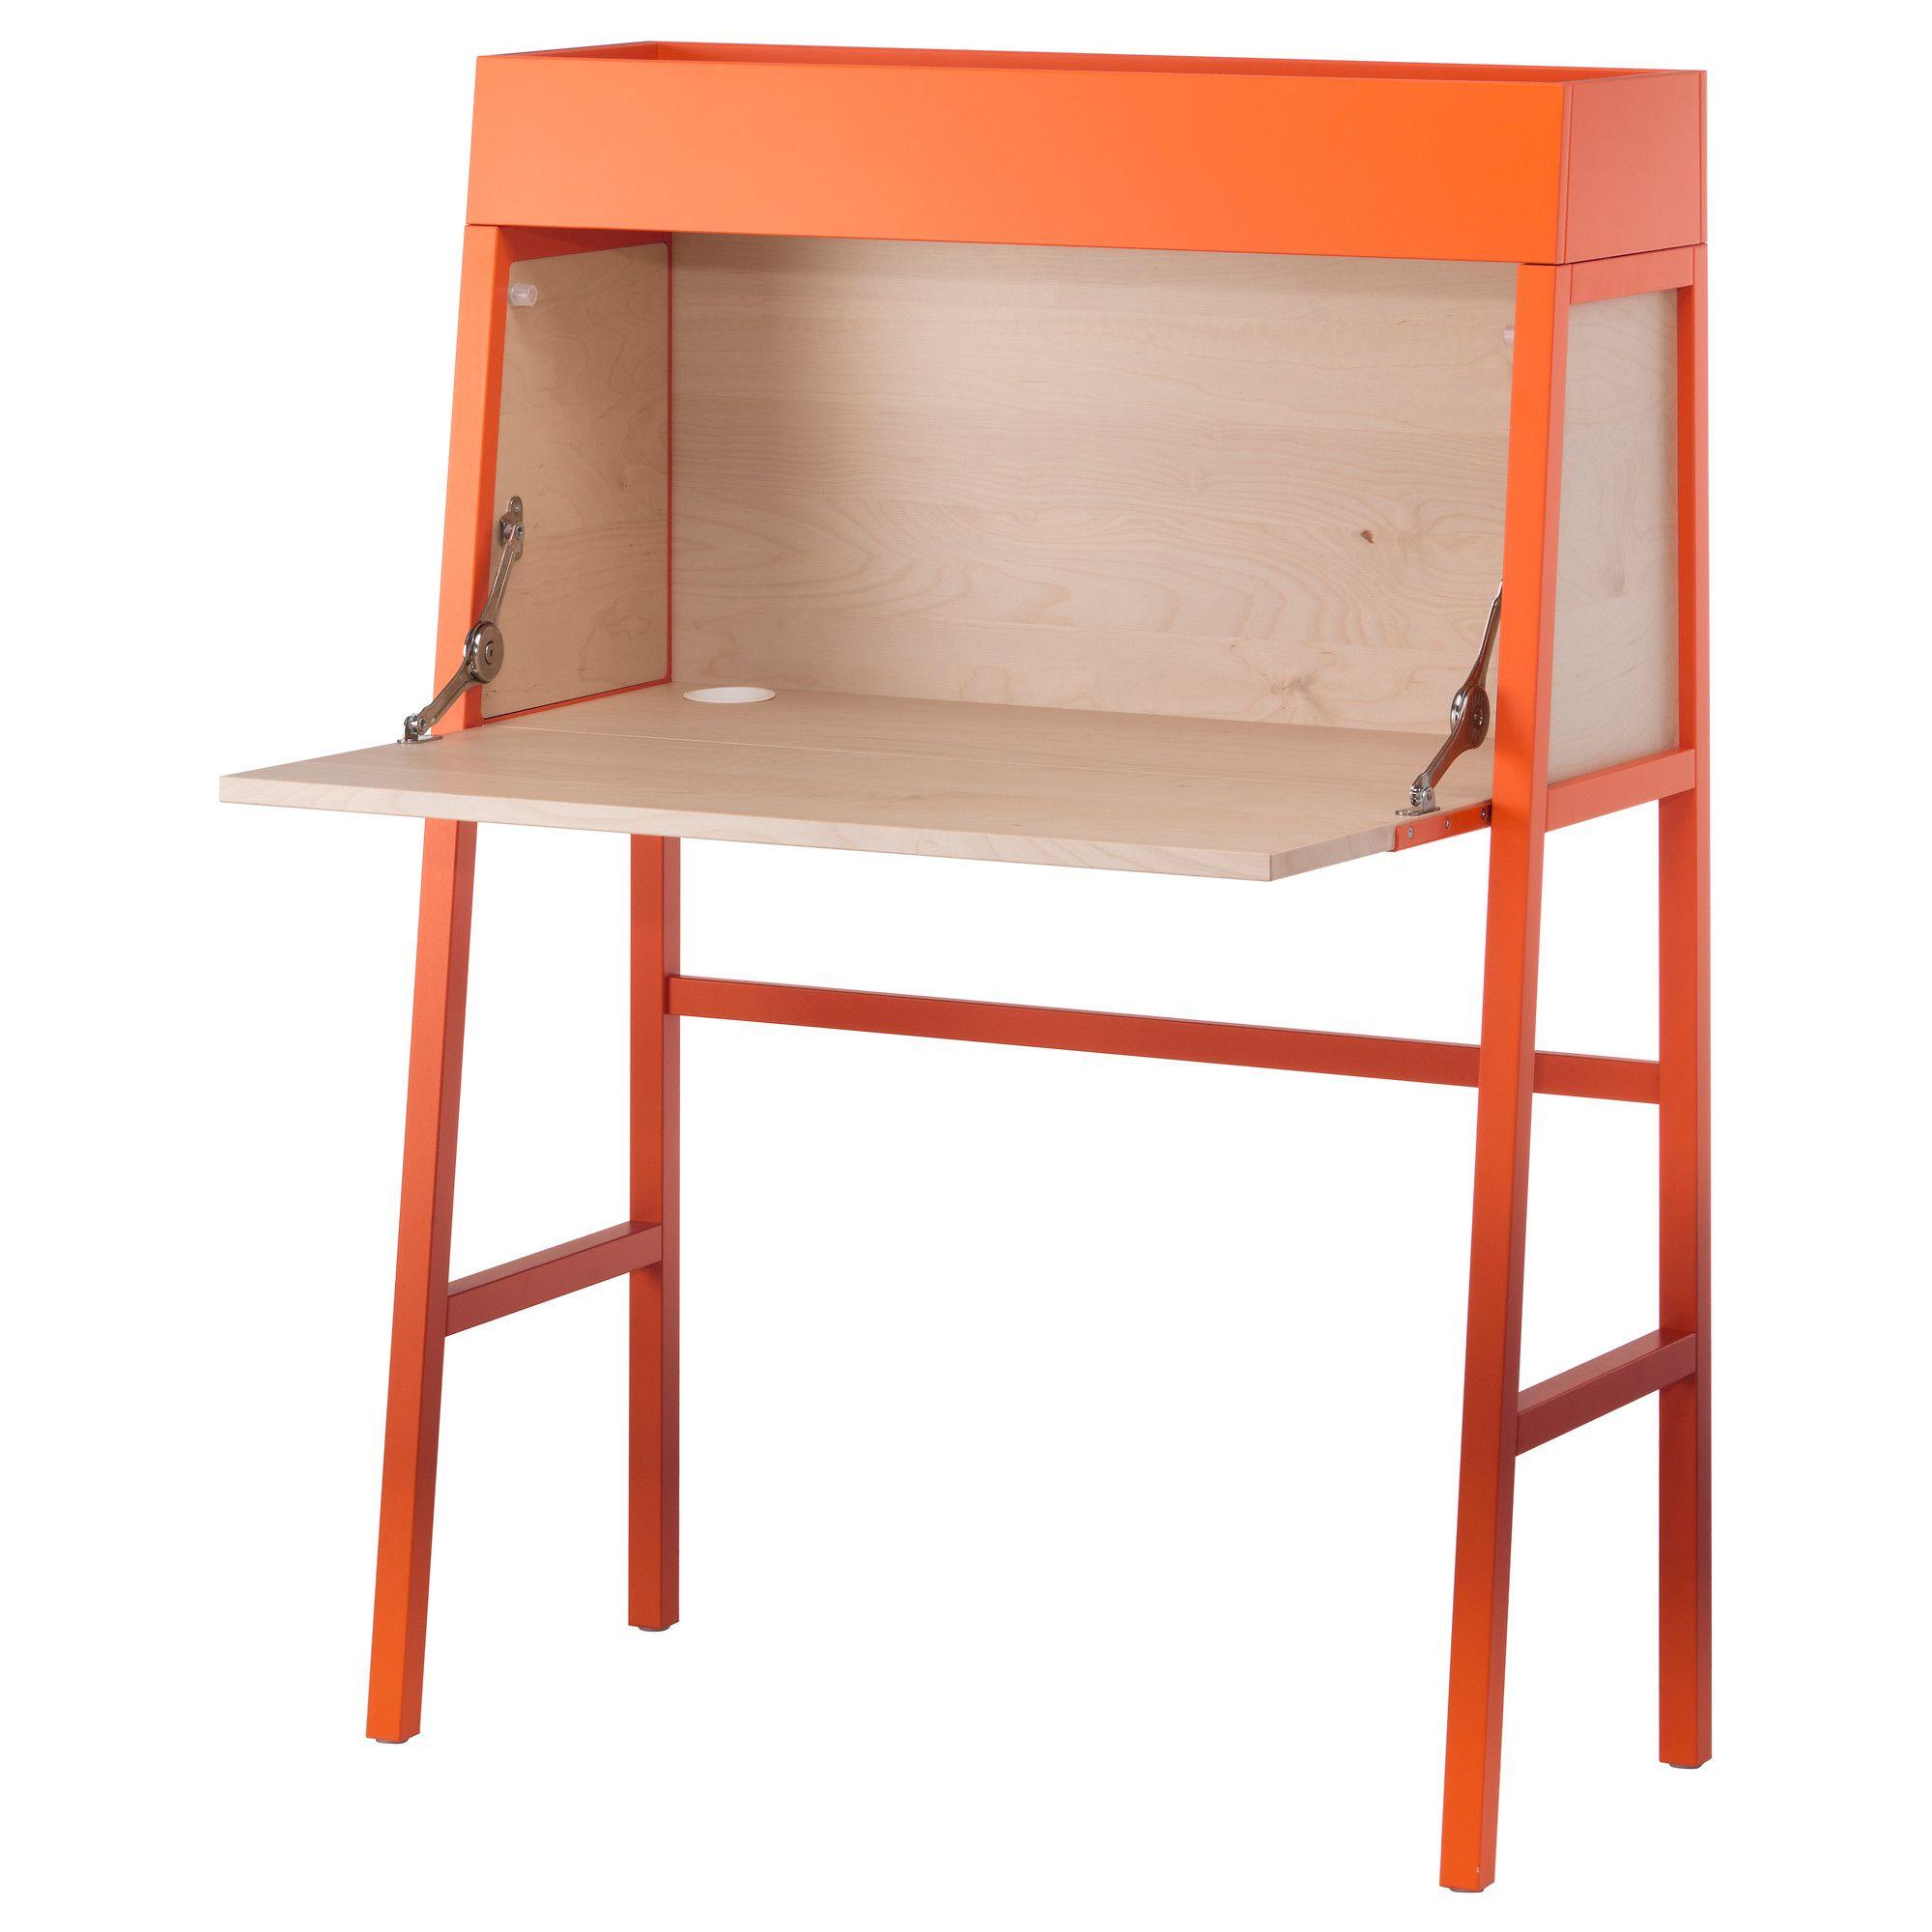 Ikea Us Furniture And Home Furnishings Ikea Ps Ikea Ps 2014 Ikea